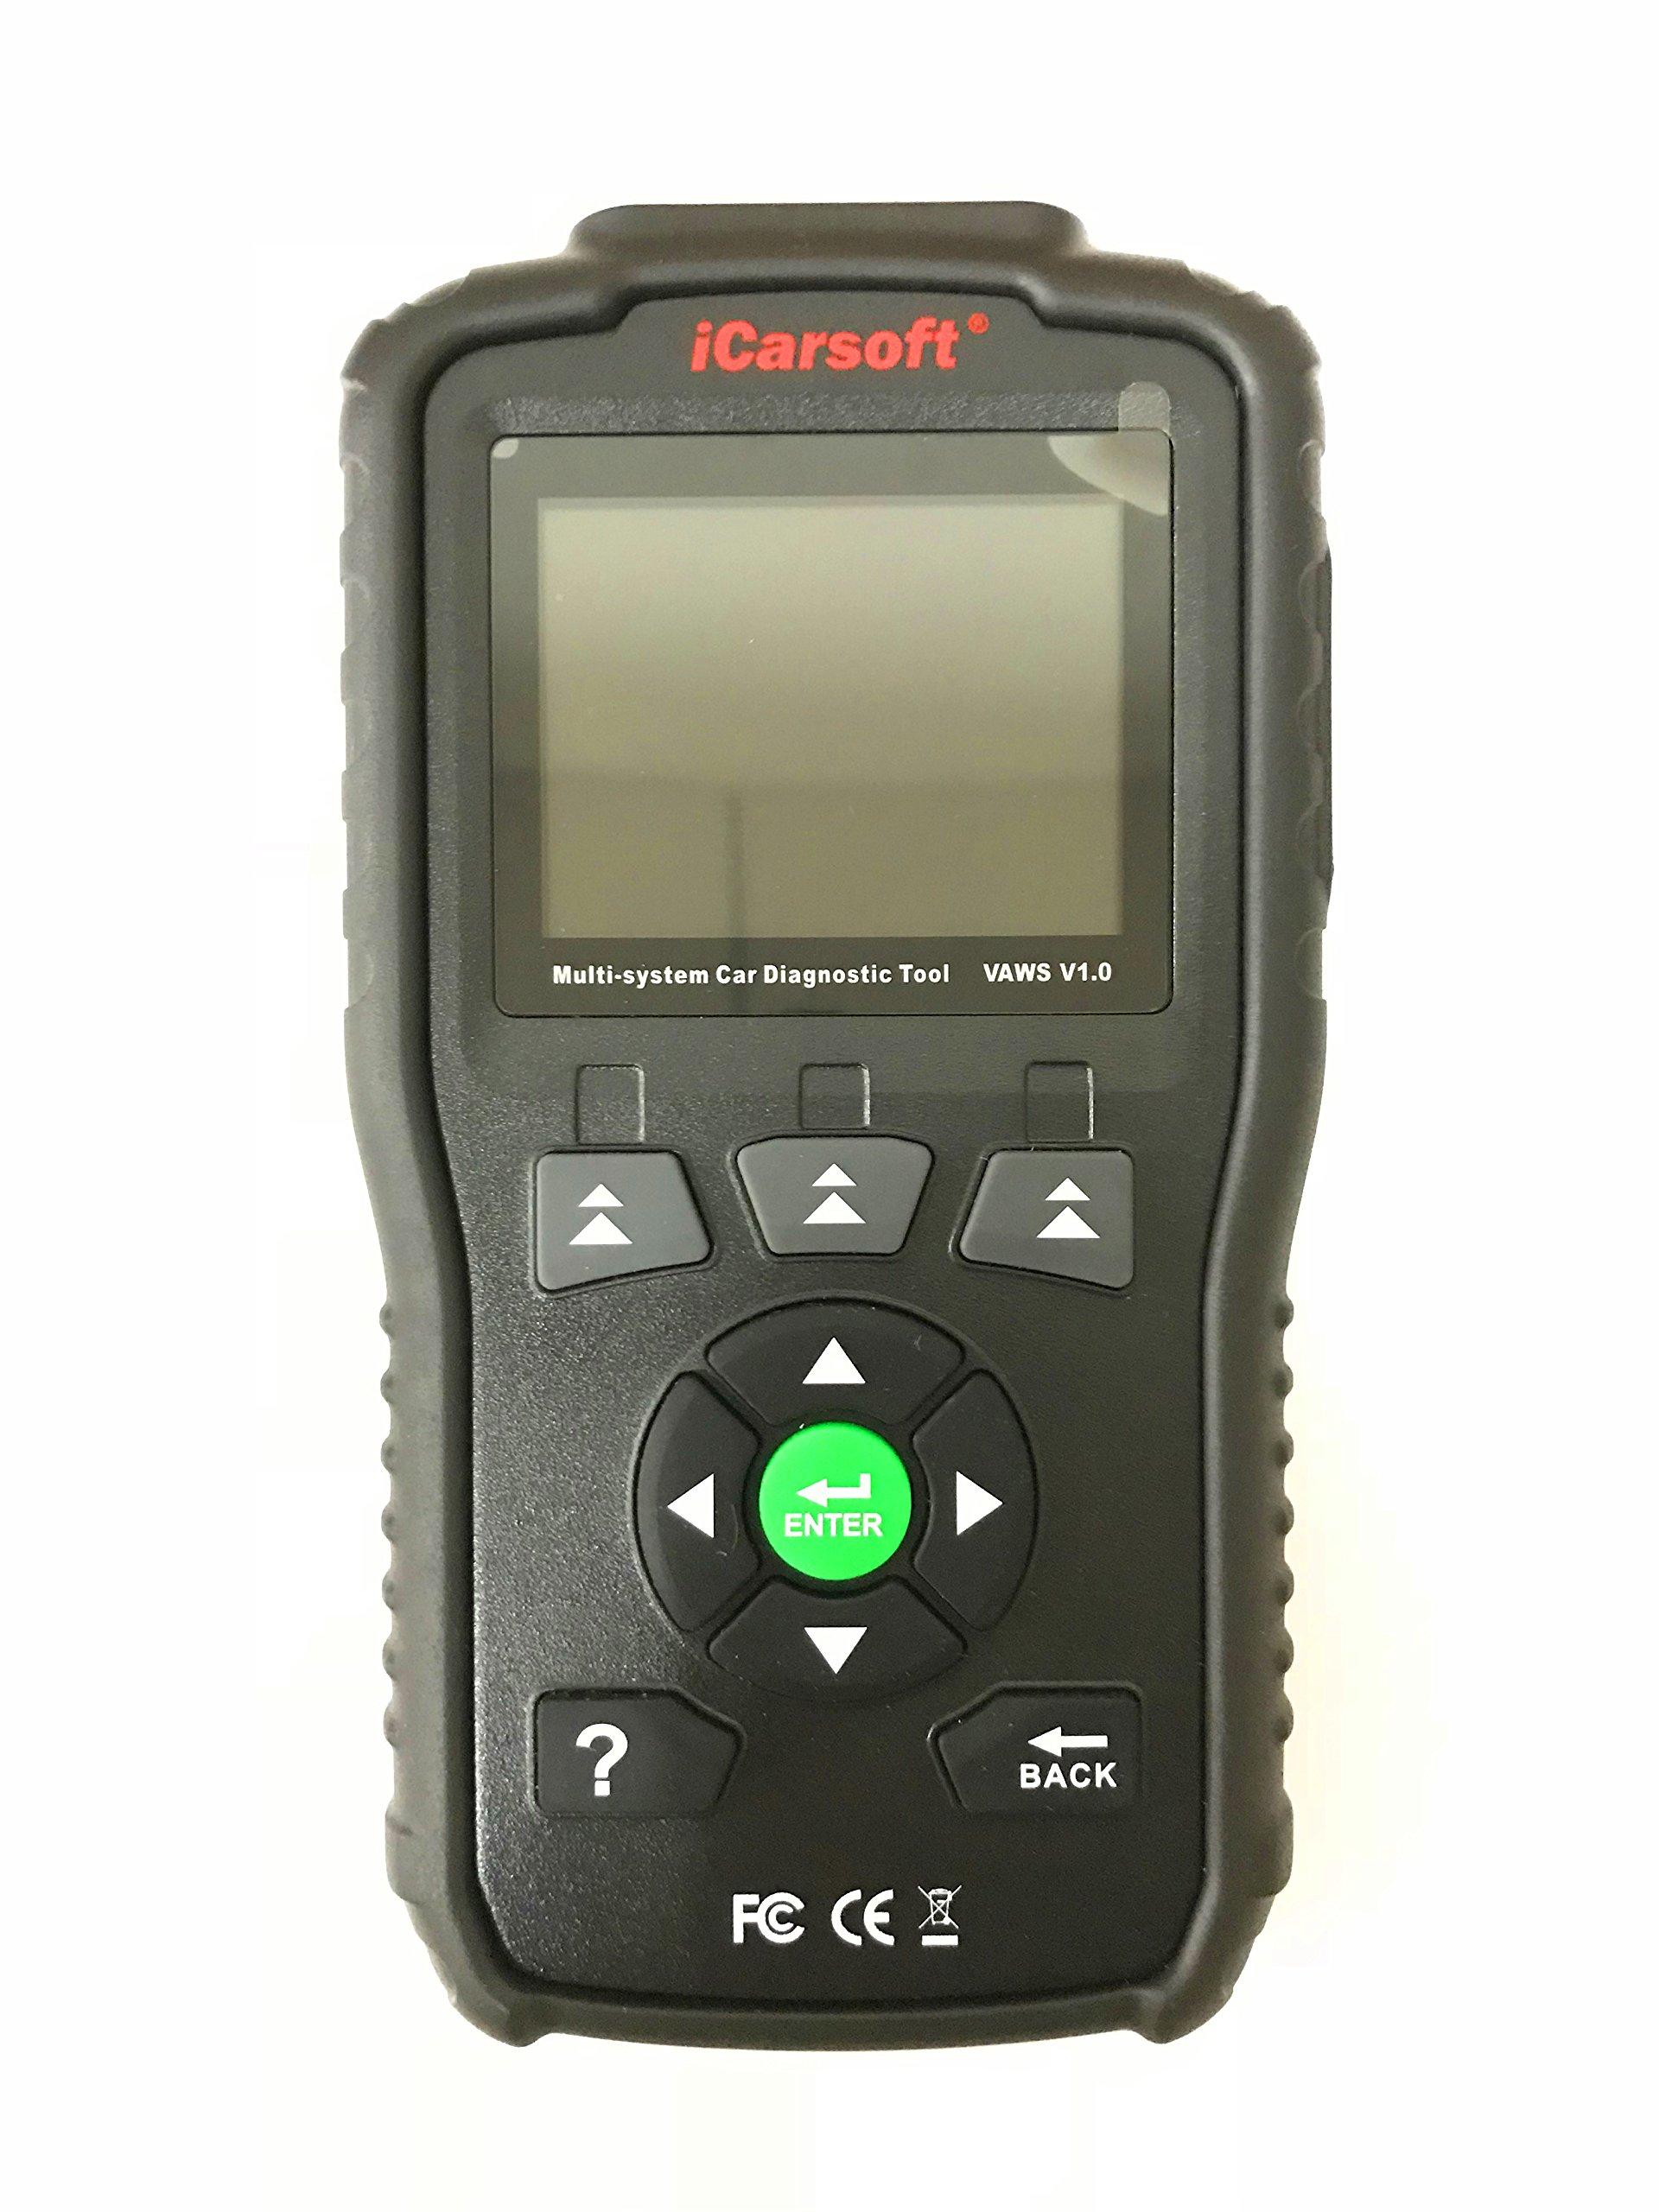 iCarsoft Professional Multi-system OBD II scanner VAWS V1.0 With Oil Service Reset for Audi/VW/Seat/Skoda (black)